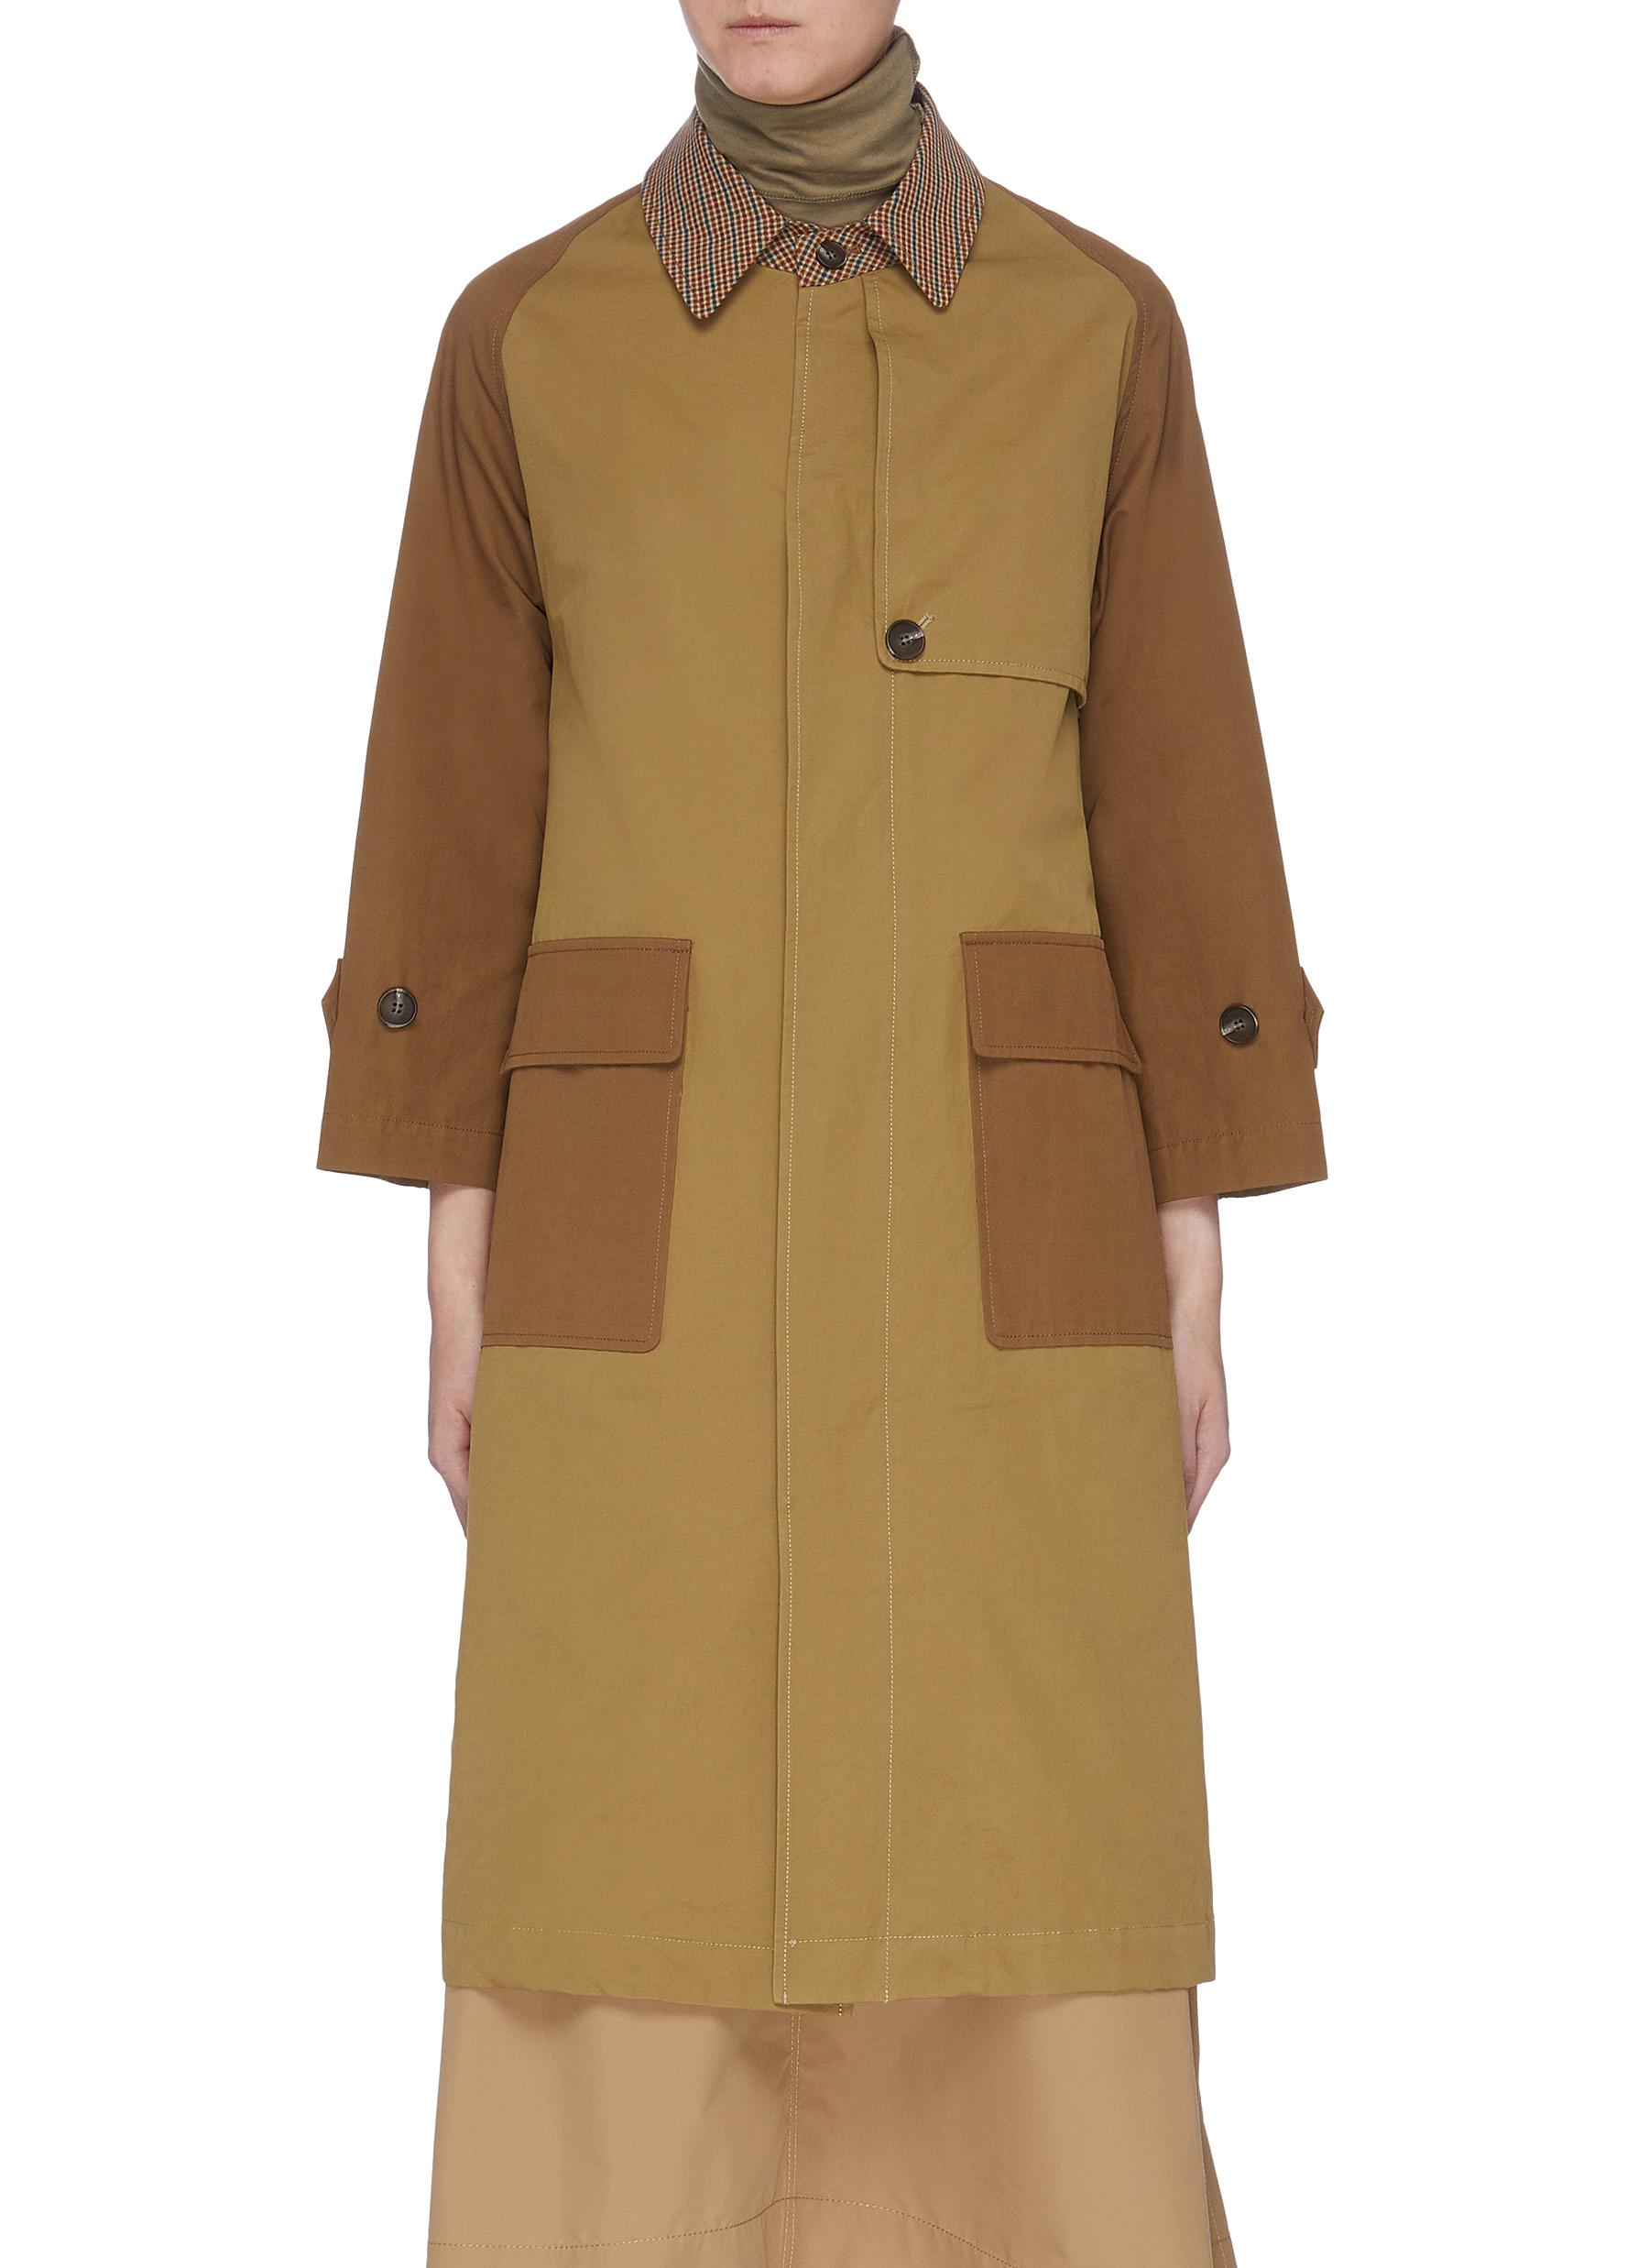 Gingham check collar colourblock flap pocket trench coat by Mijeong Park